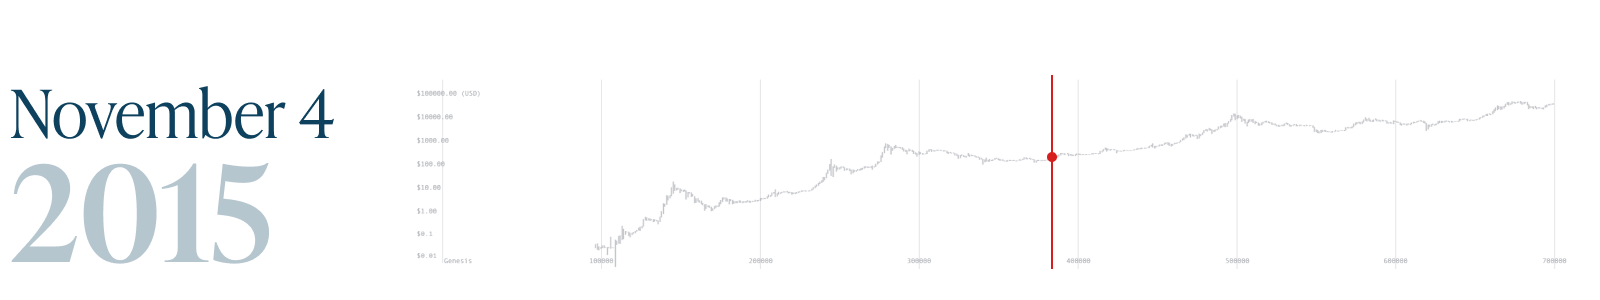 Monochrome_Bitcoin Block 700k_4 Nov 2015.png